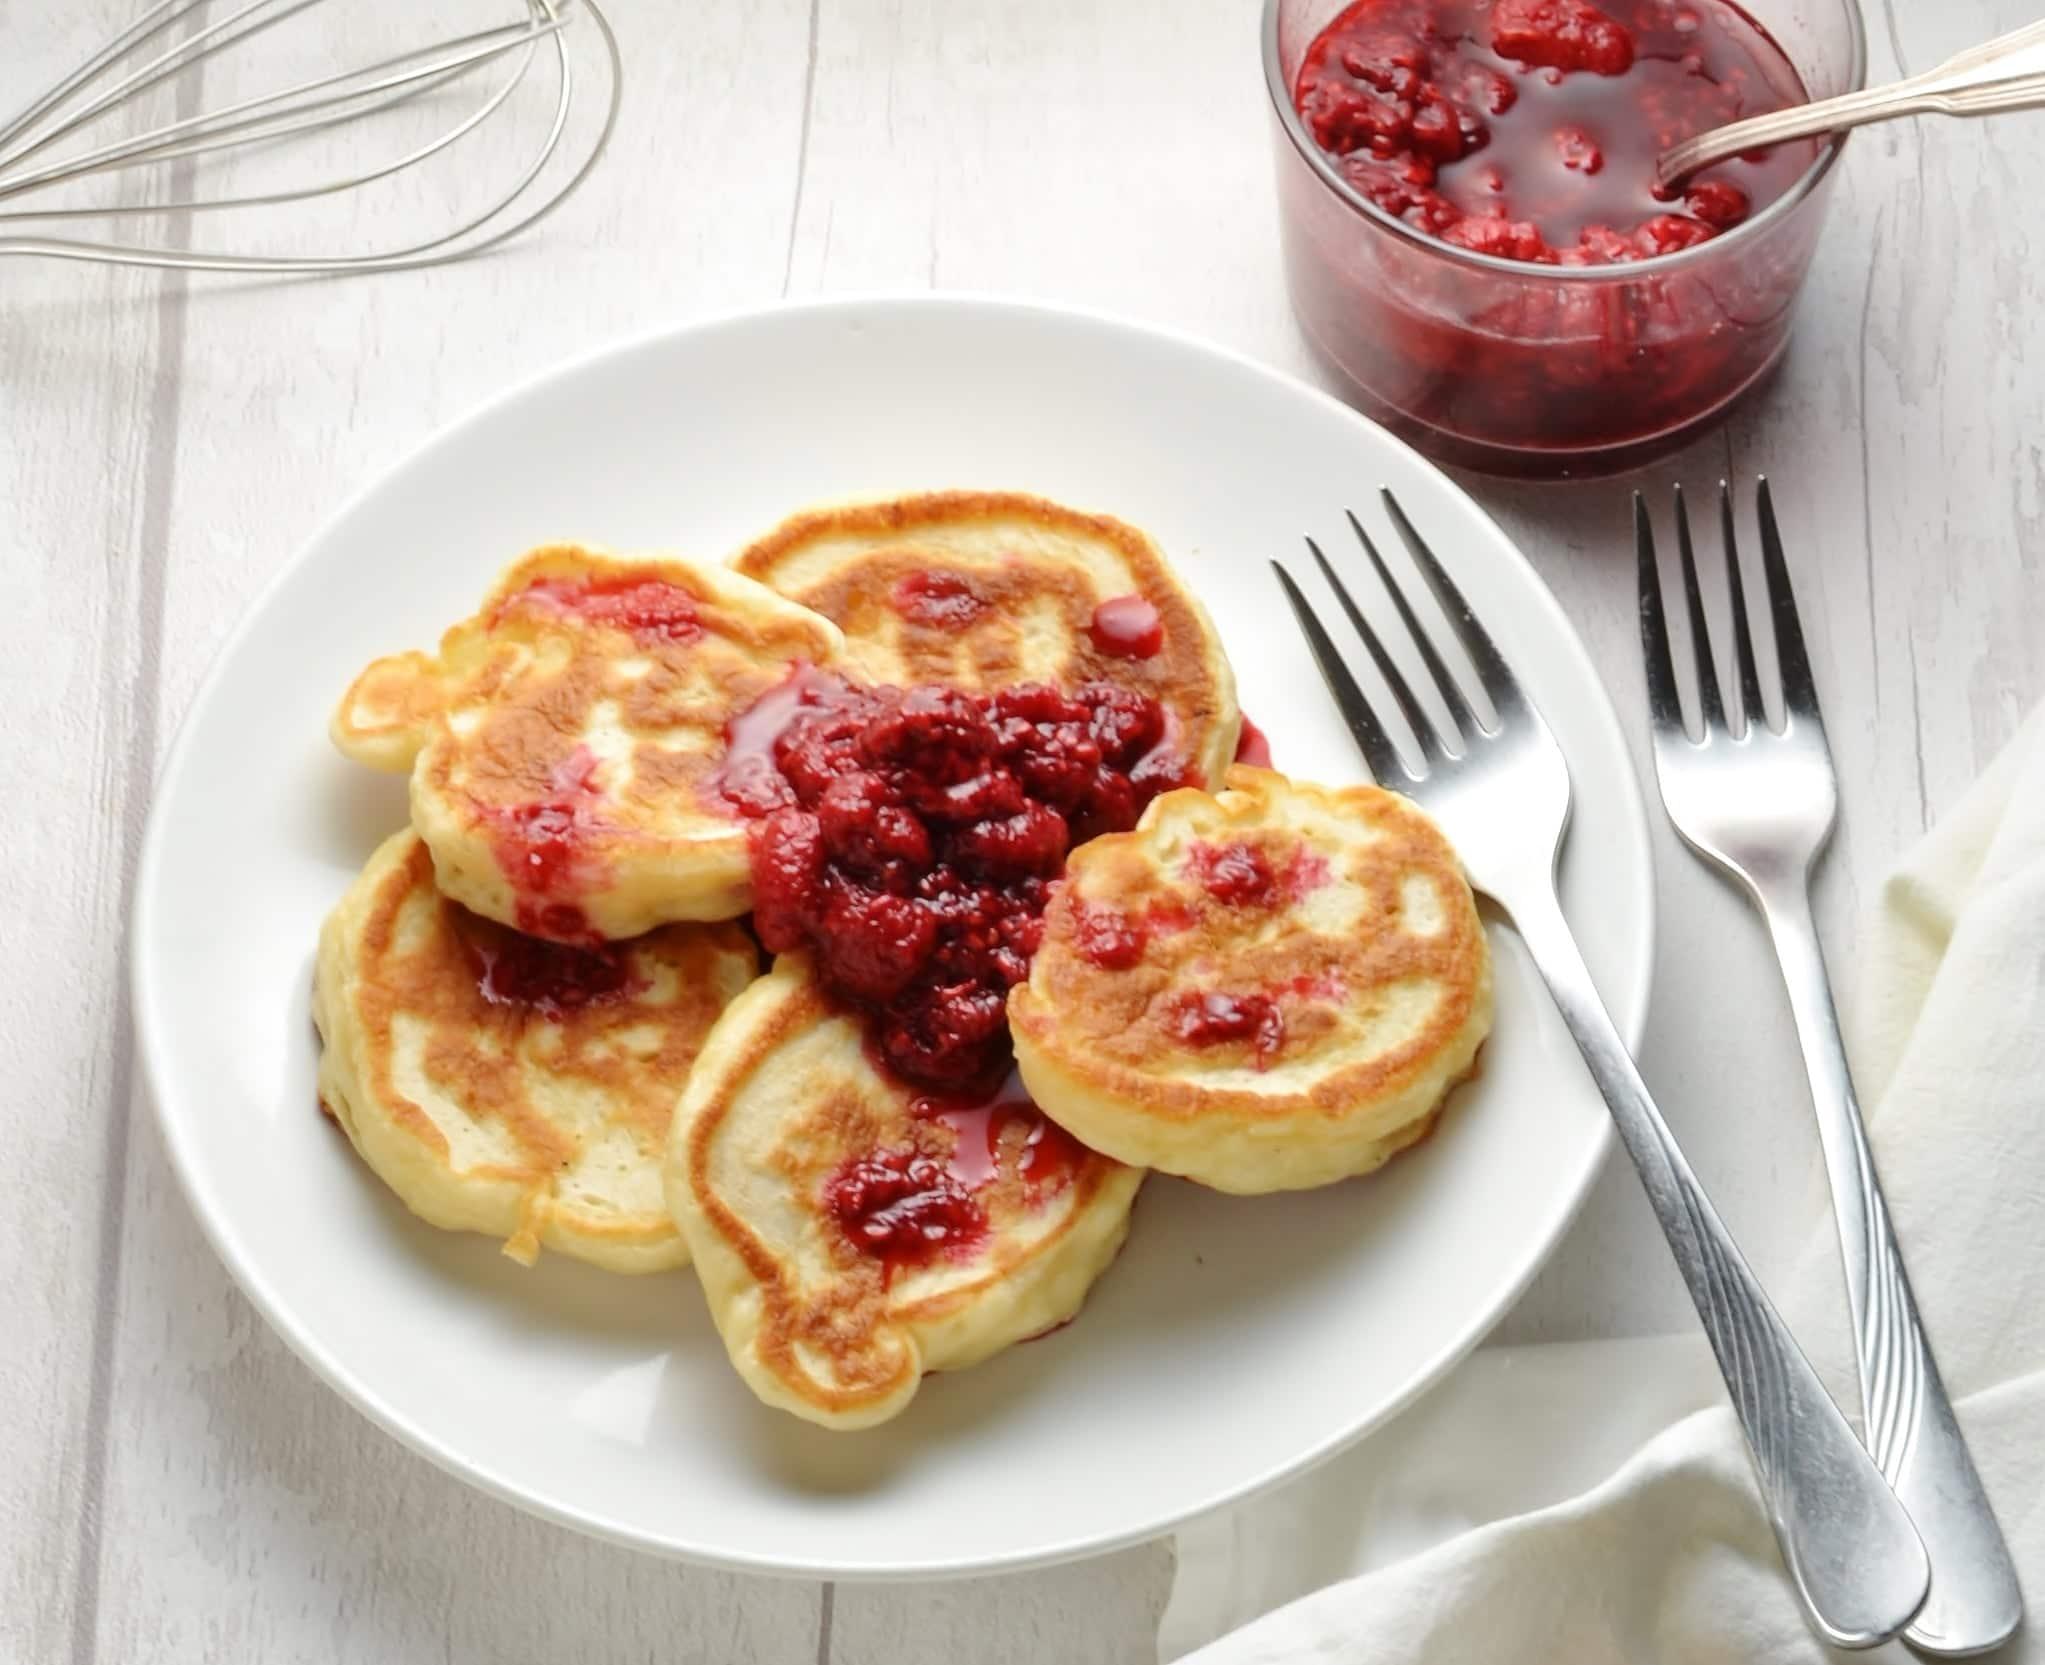 Polish Pancakes with Yeast (Racuchy)